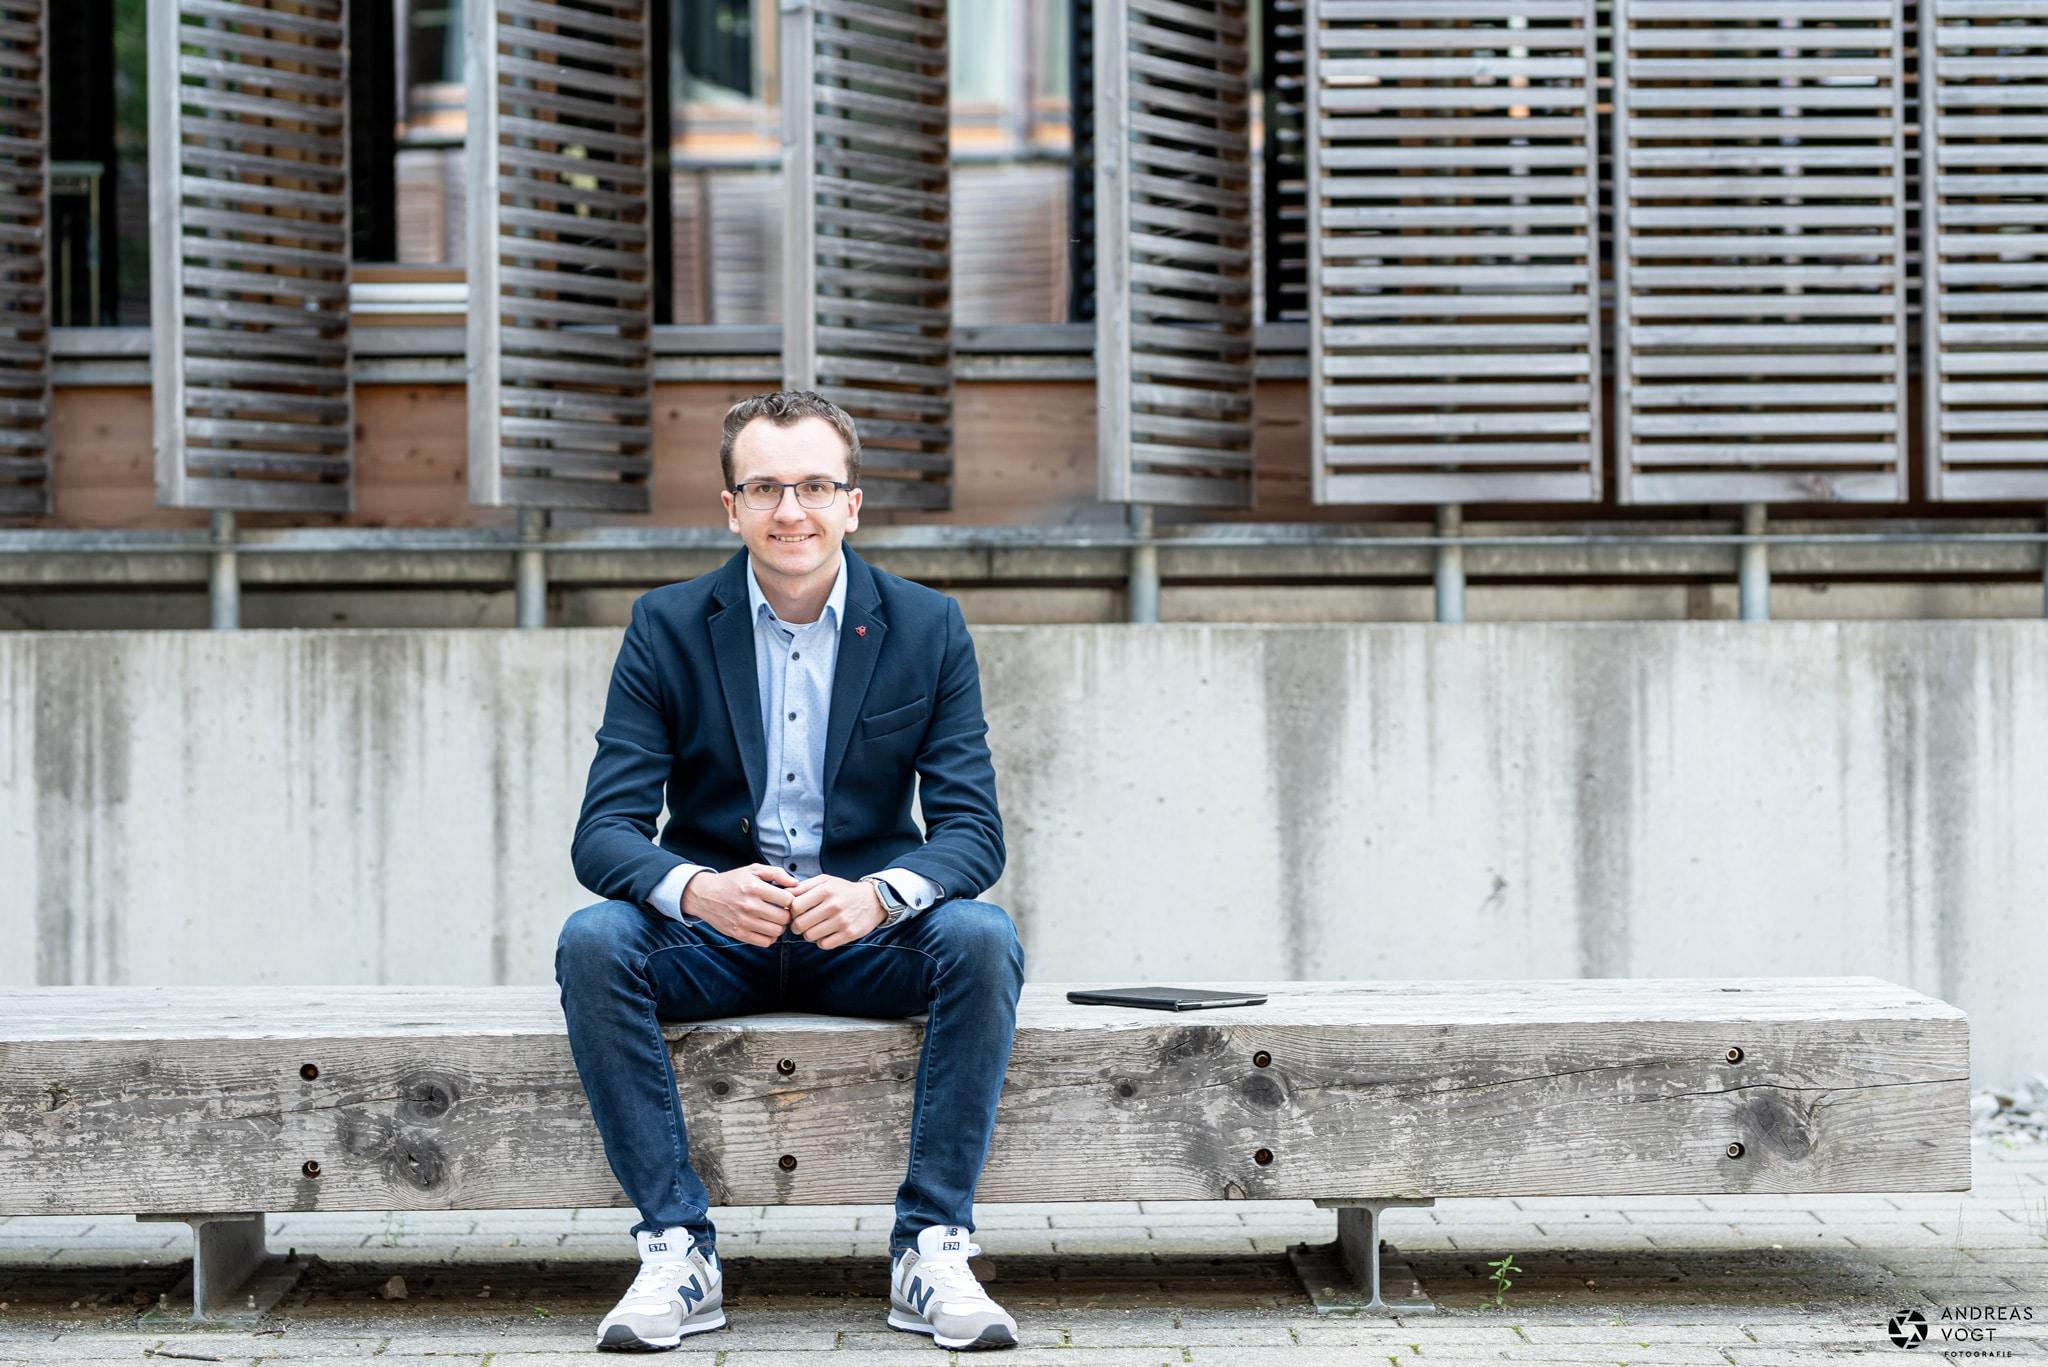 andreas-vogt-fotograf-aalen-businessfotos